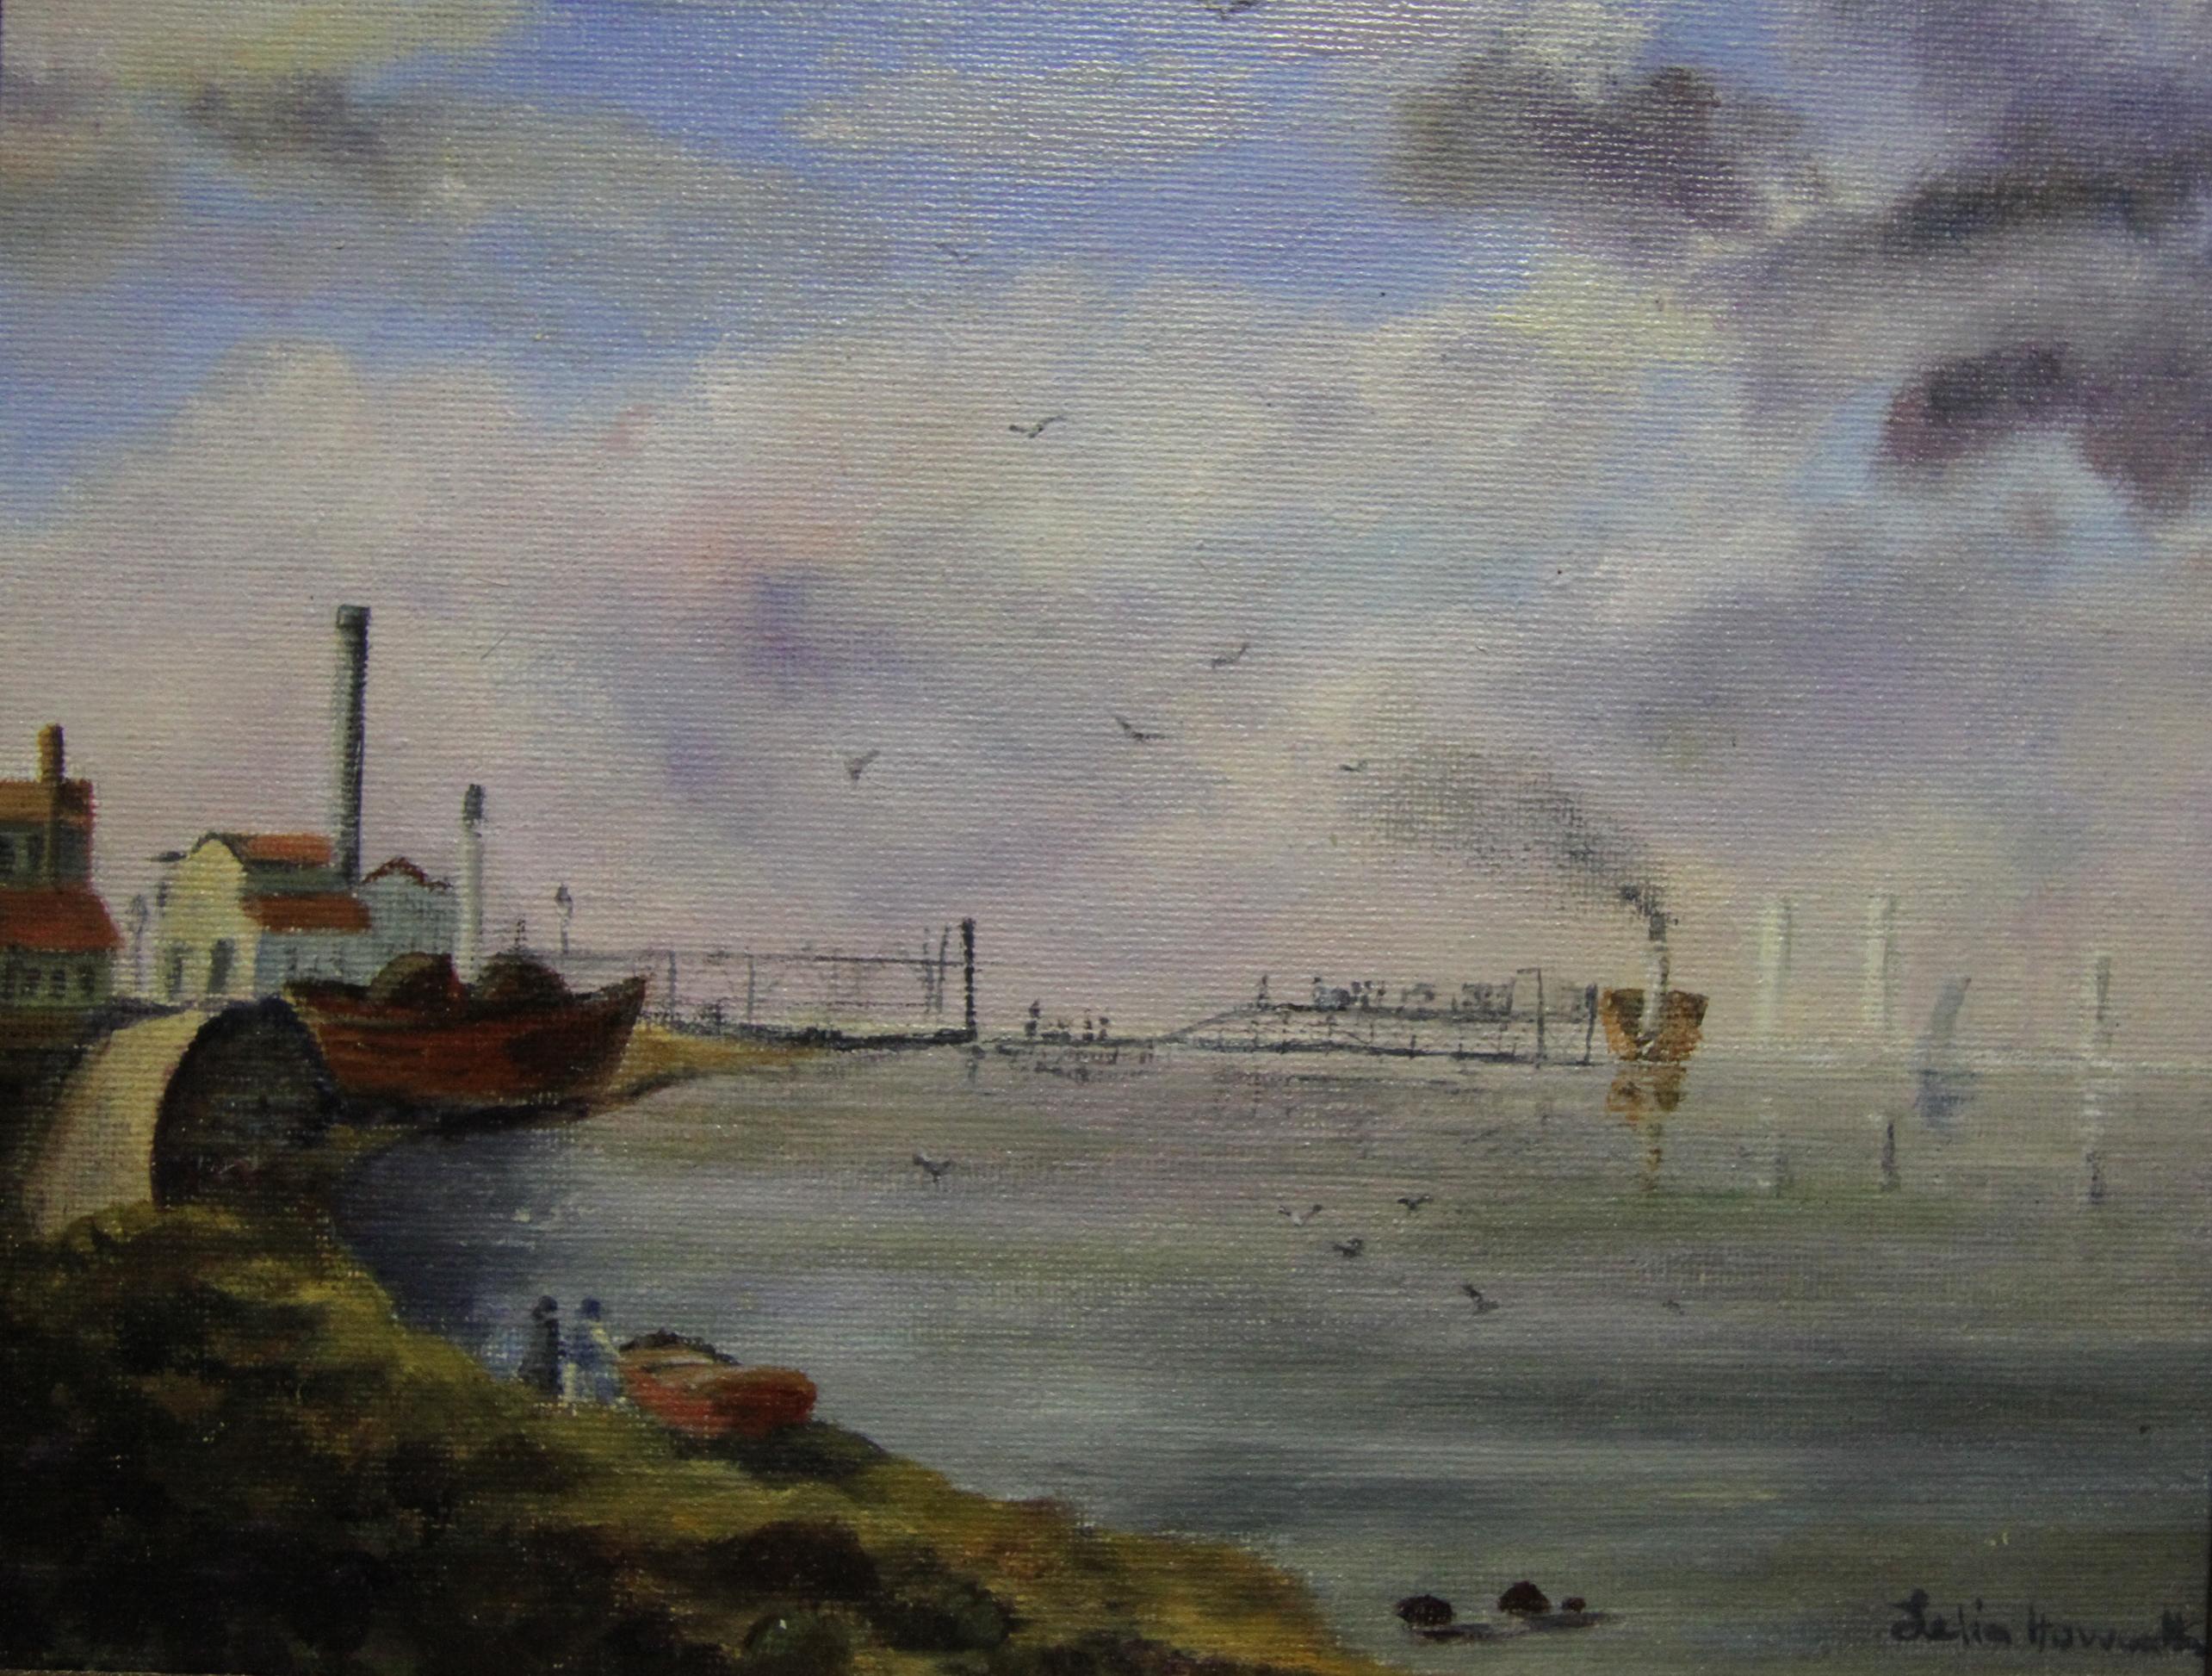 Egremont Ferry 1860 (after Herdsman)